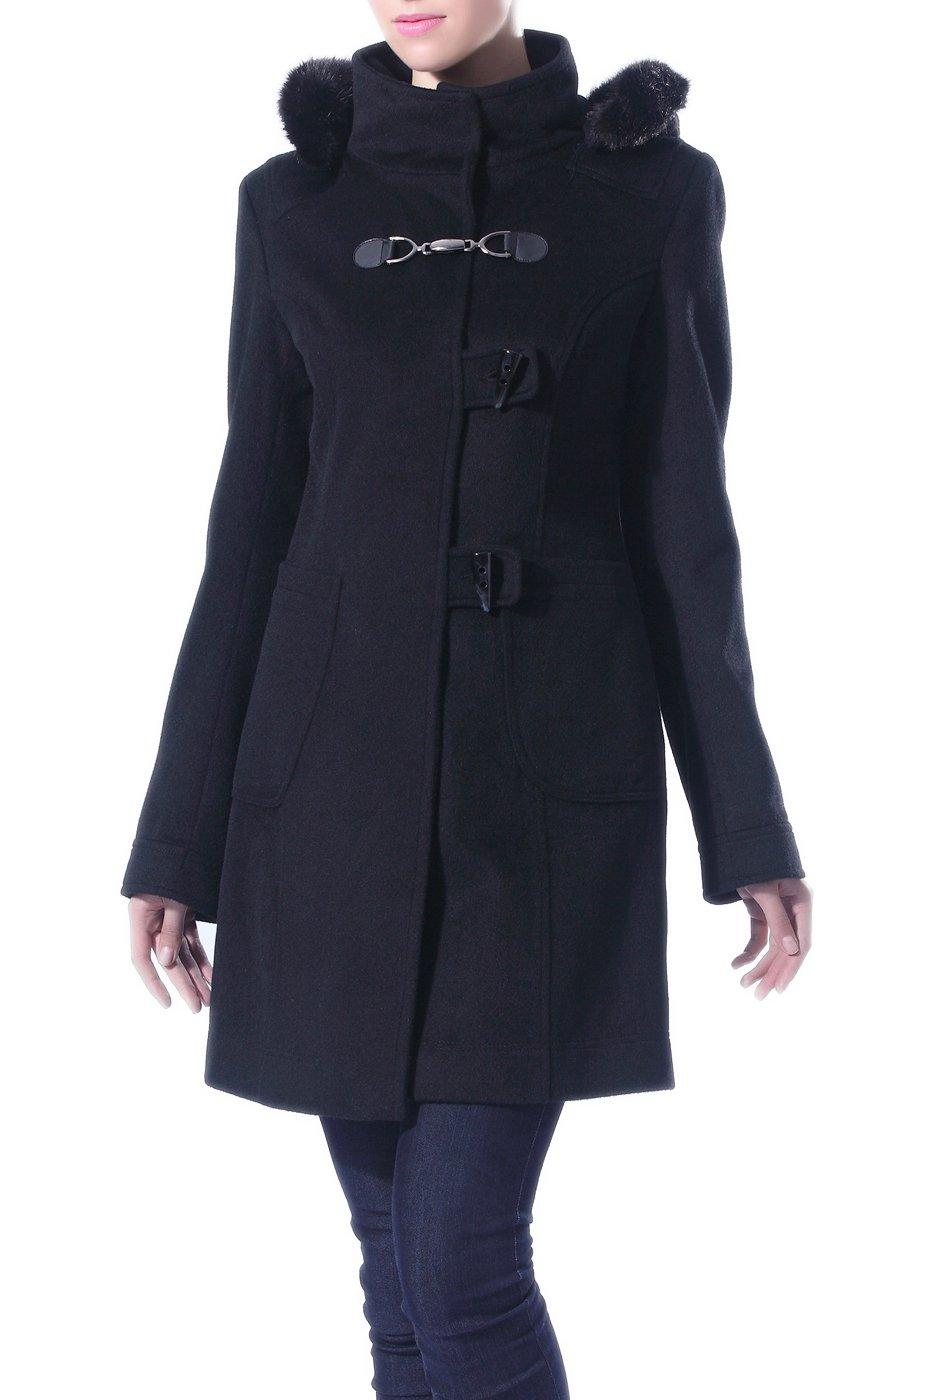 Jessie G. Women's Cashmere Blend Parka Coat